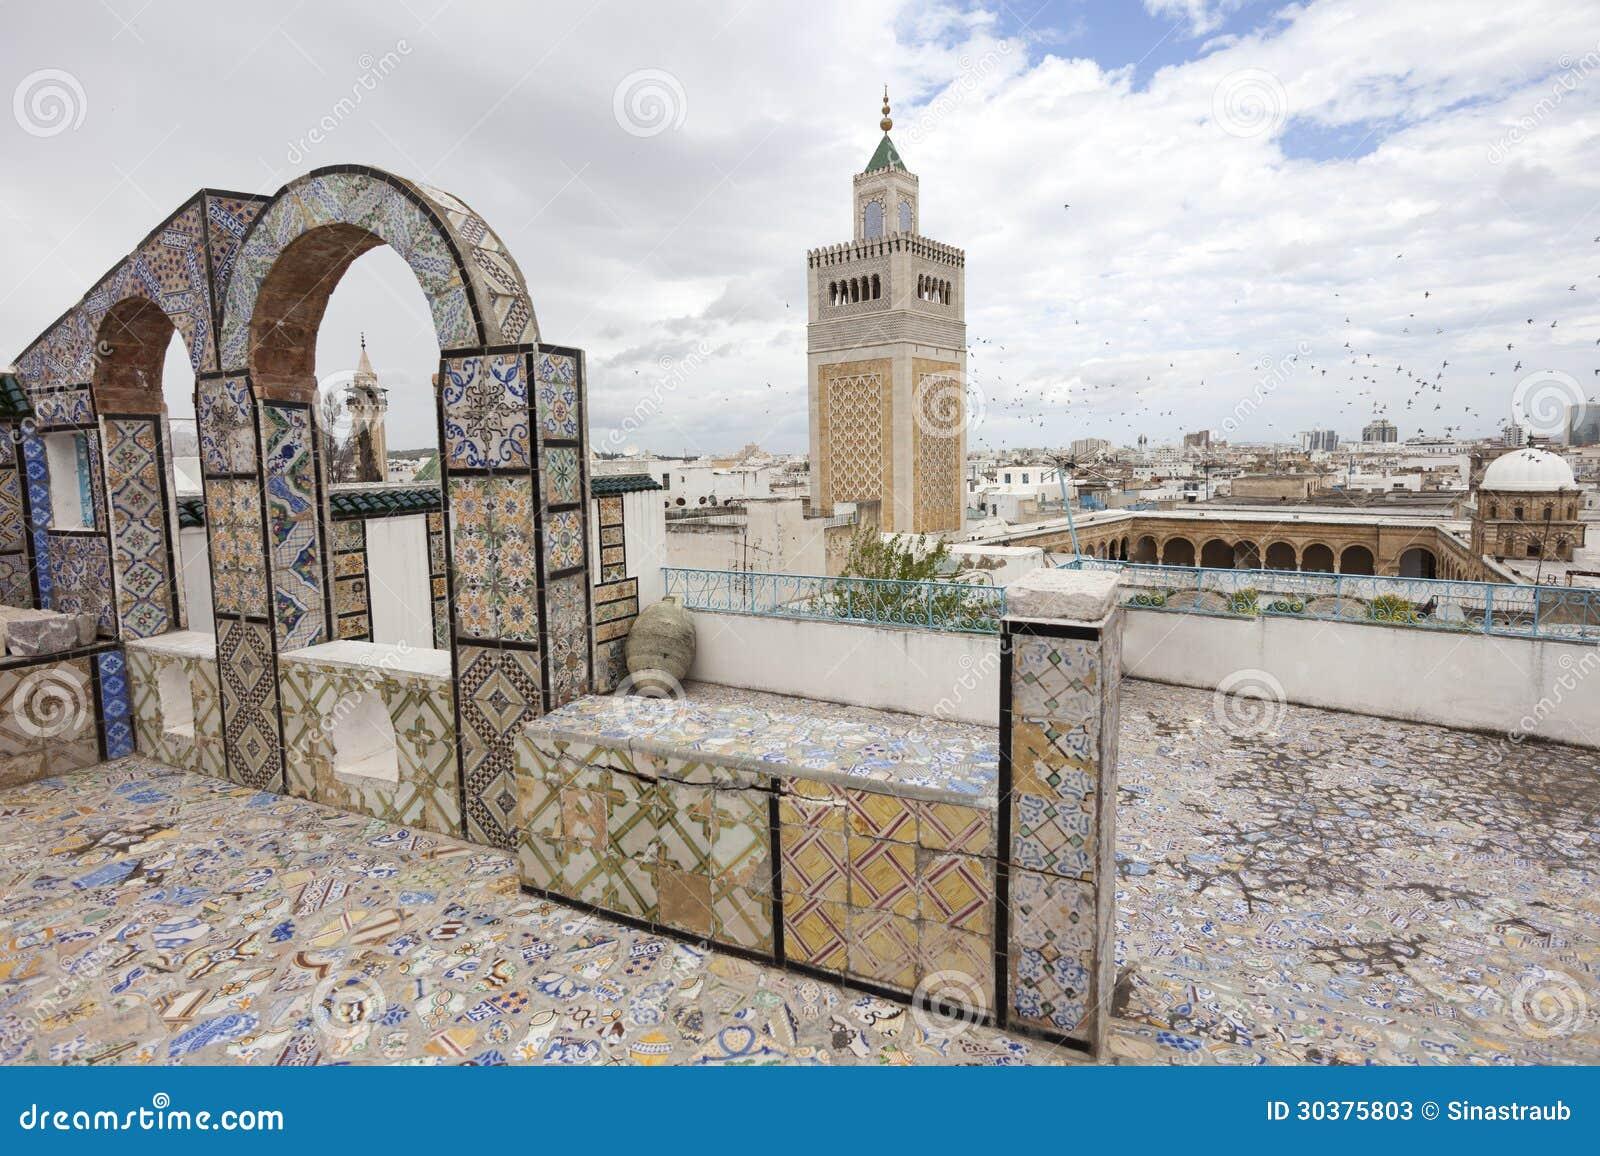 Al Zaytuna Mosque Stock Image Image Of Tunisia Roof 30375803